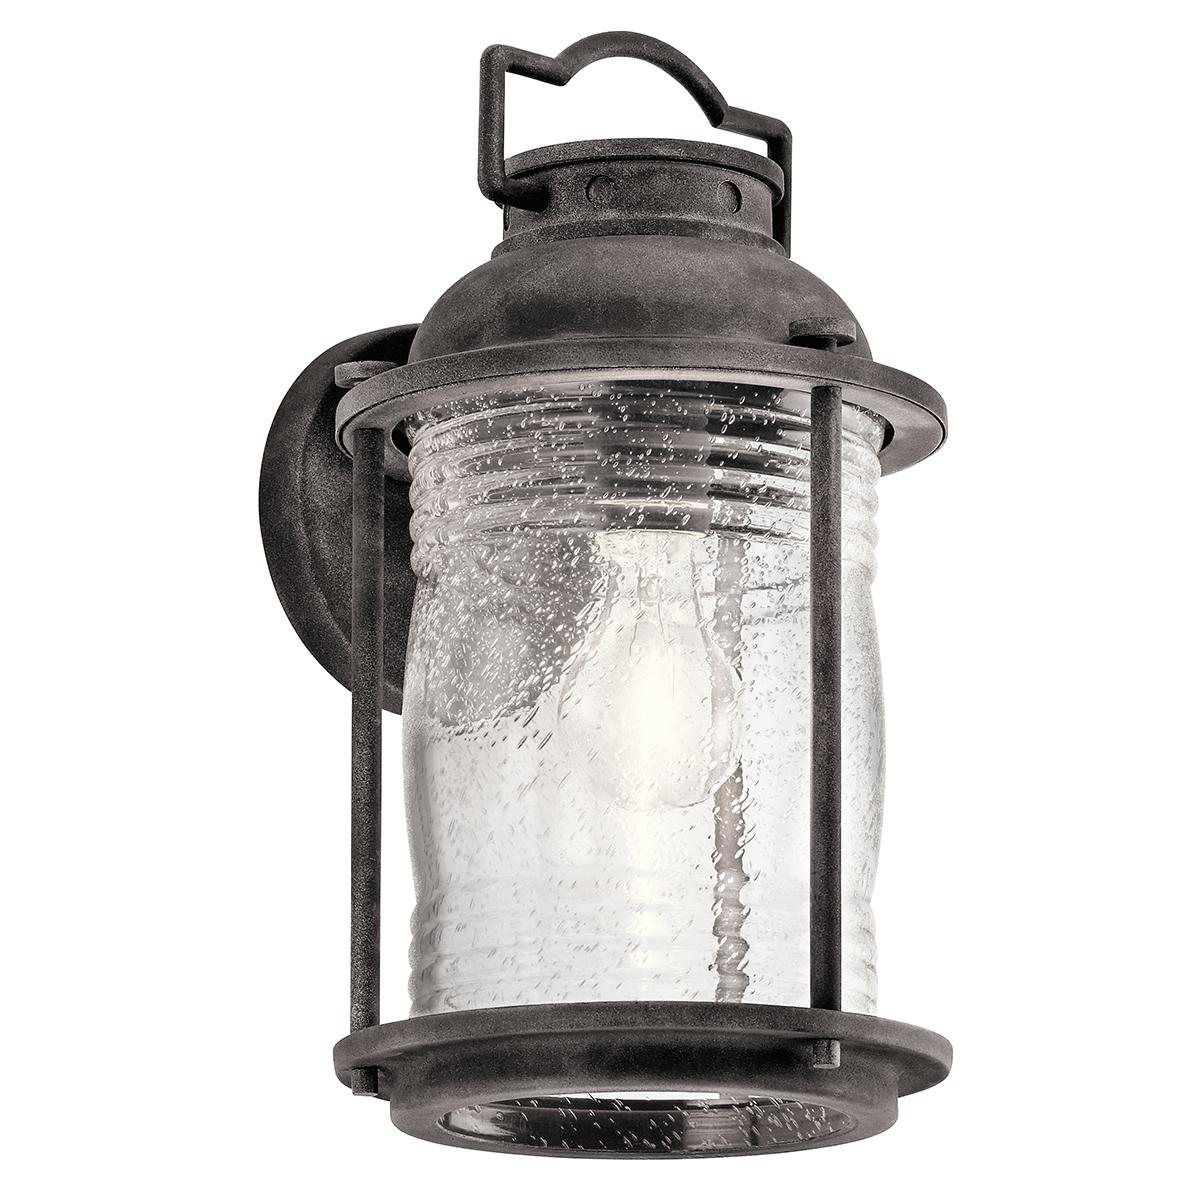 Ashland Pedestal Lantern In Weathered Zinc: Lampa ASHLAND BAY Weathered Zinc KL/ASHLANDBAY2/M Kichler